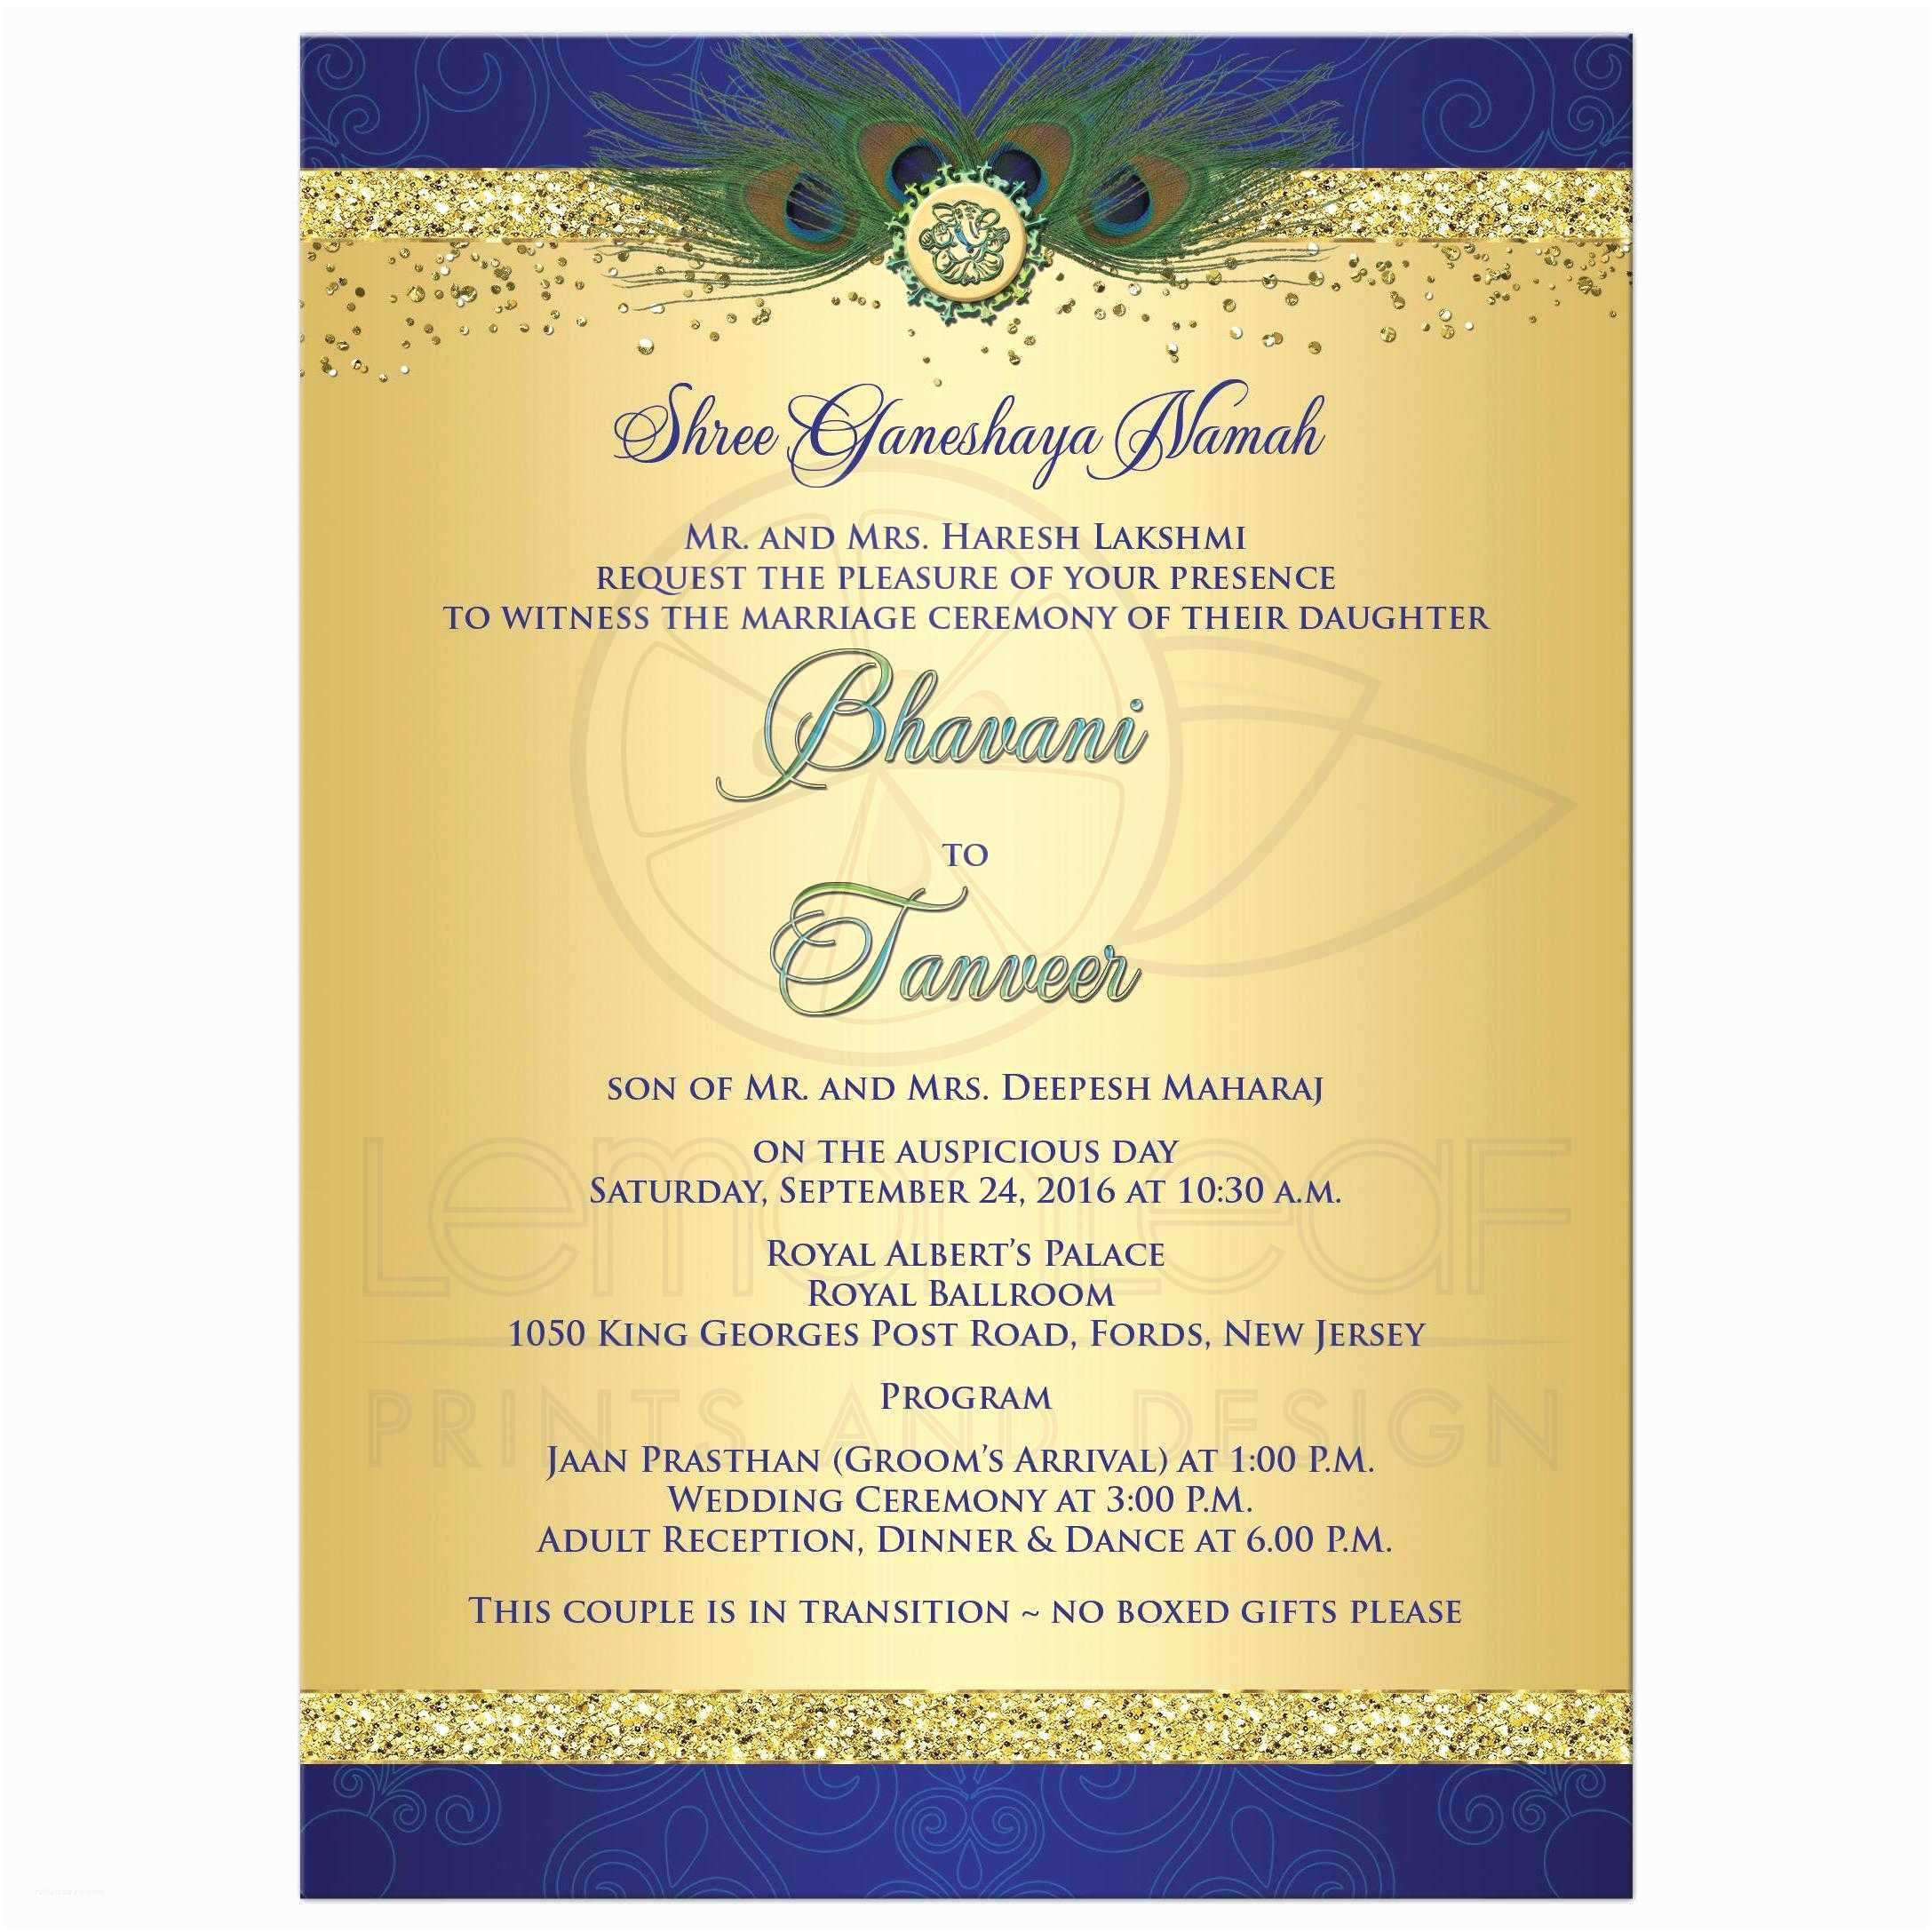 Hindu Wedding Invitations Indian Wedding Invitation Cards Indian Wedding